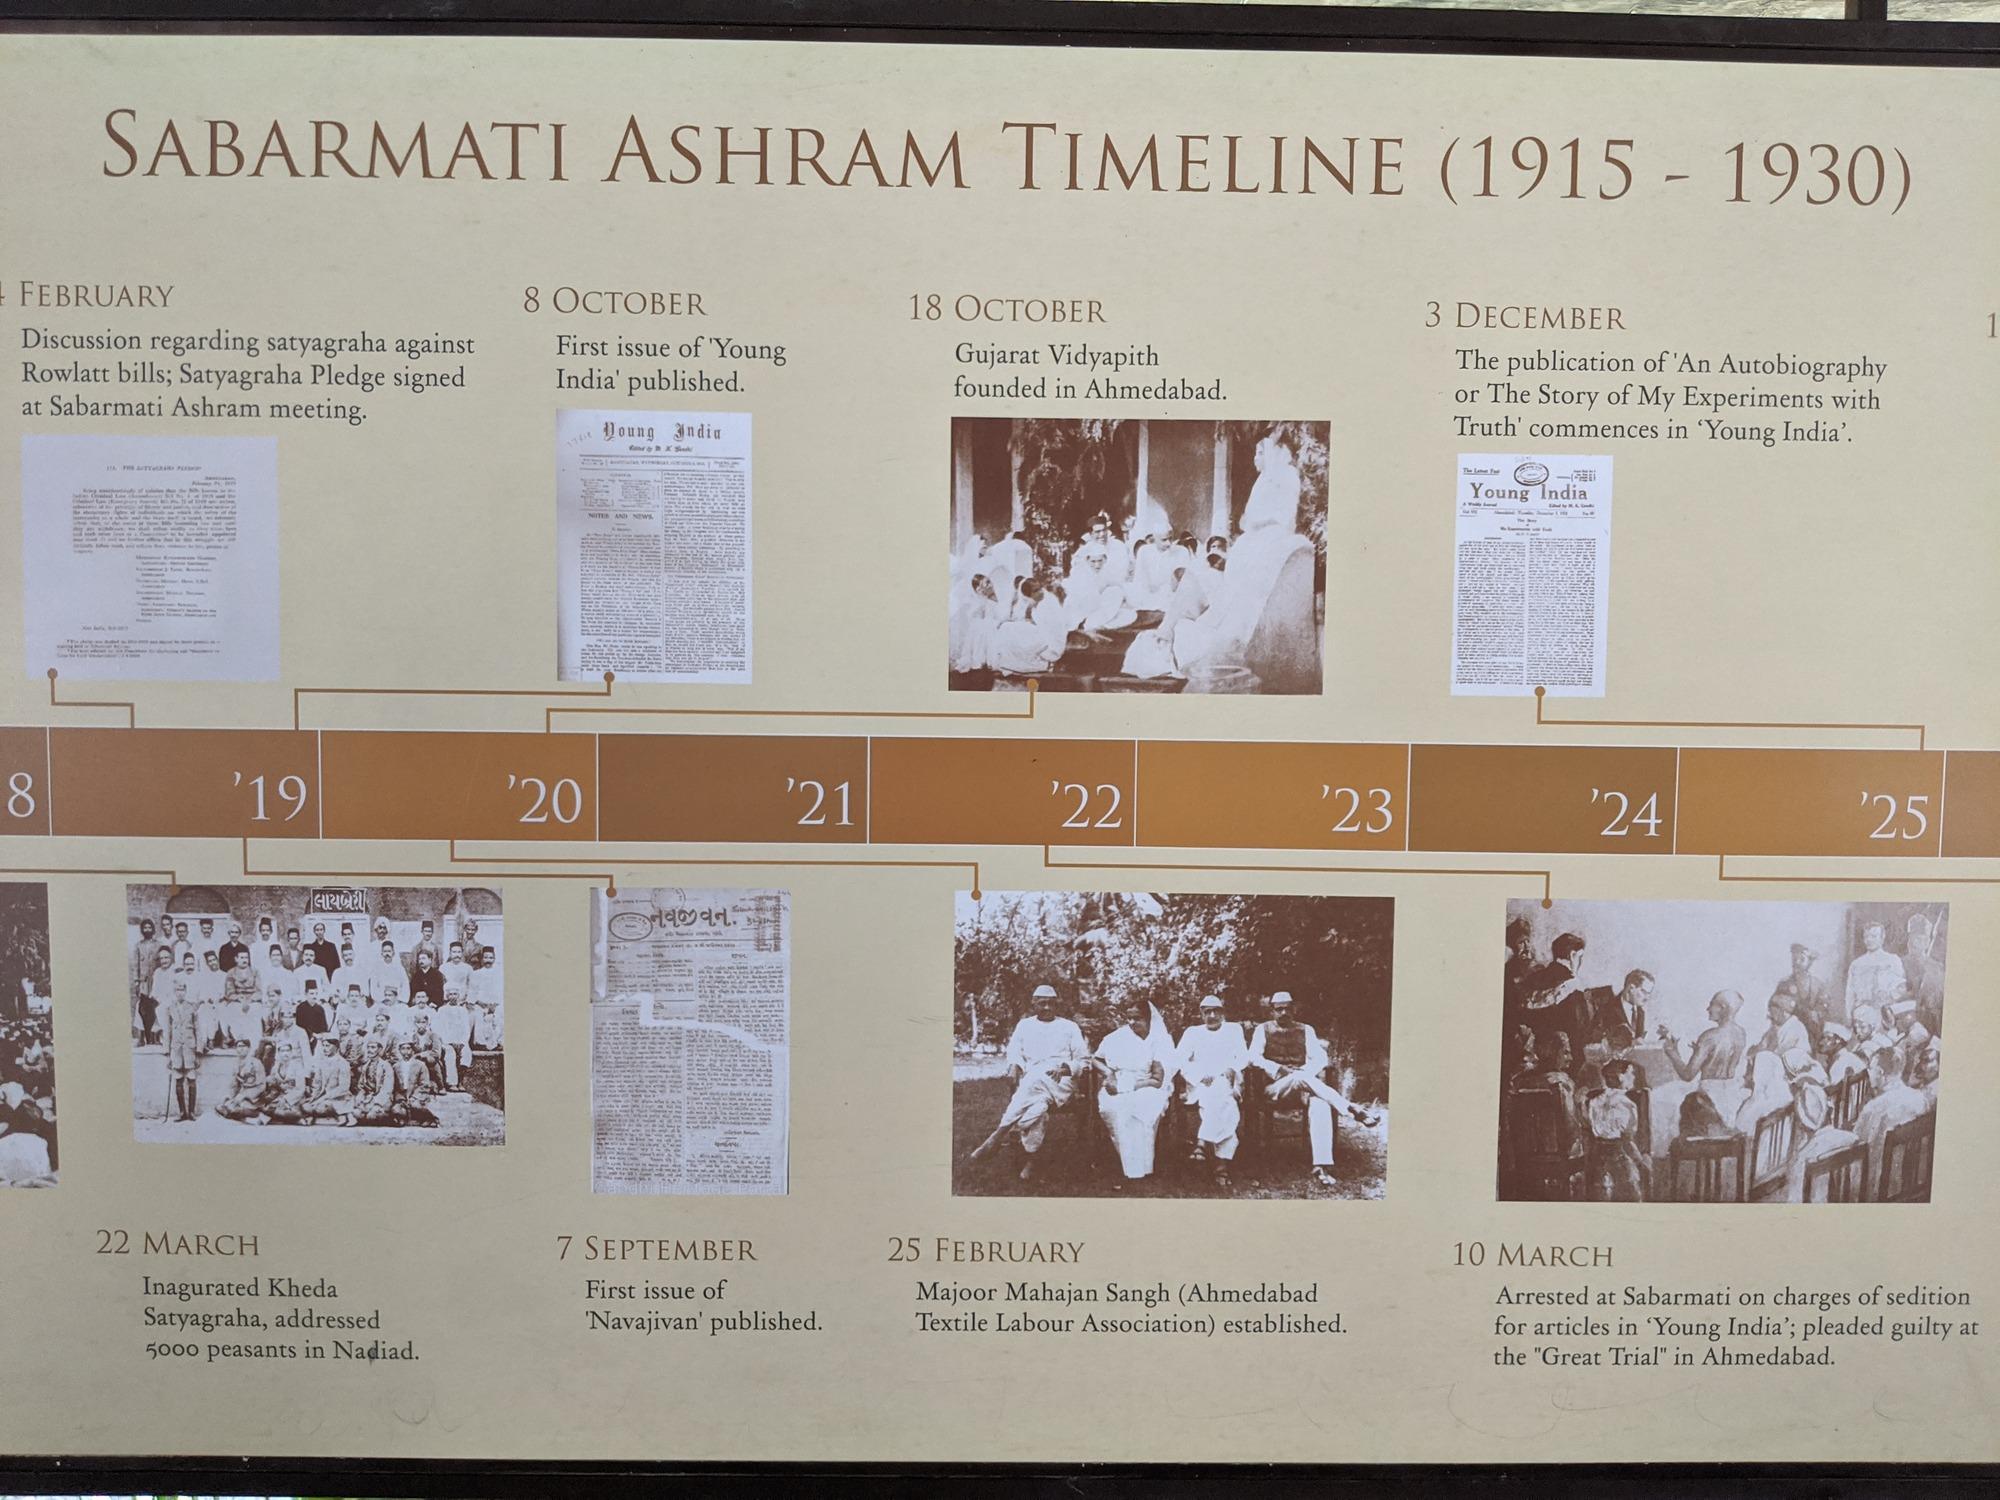 Sabarmati Ashram Timeline (1915-1930)